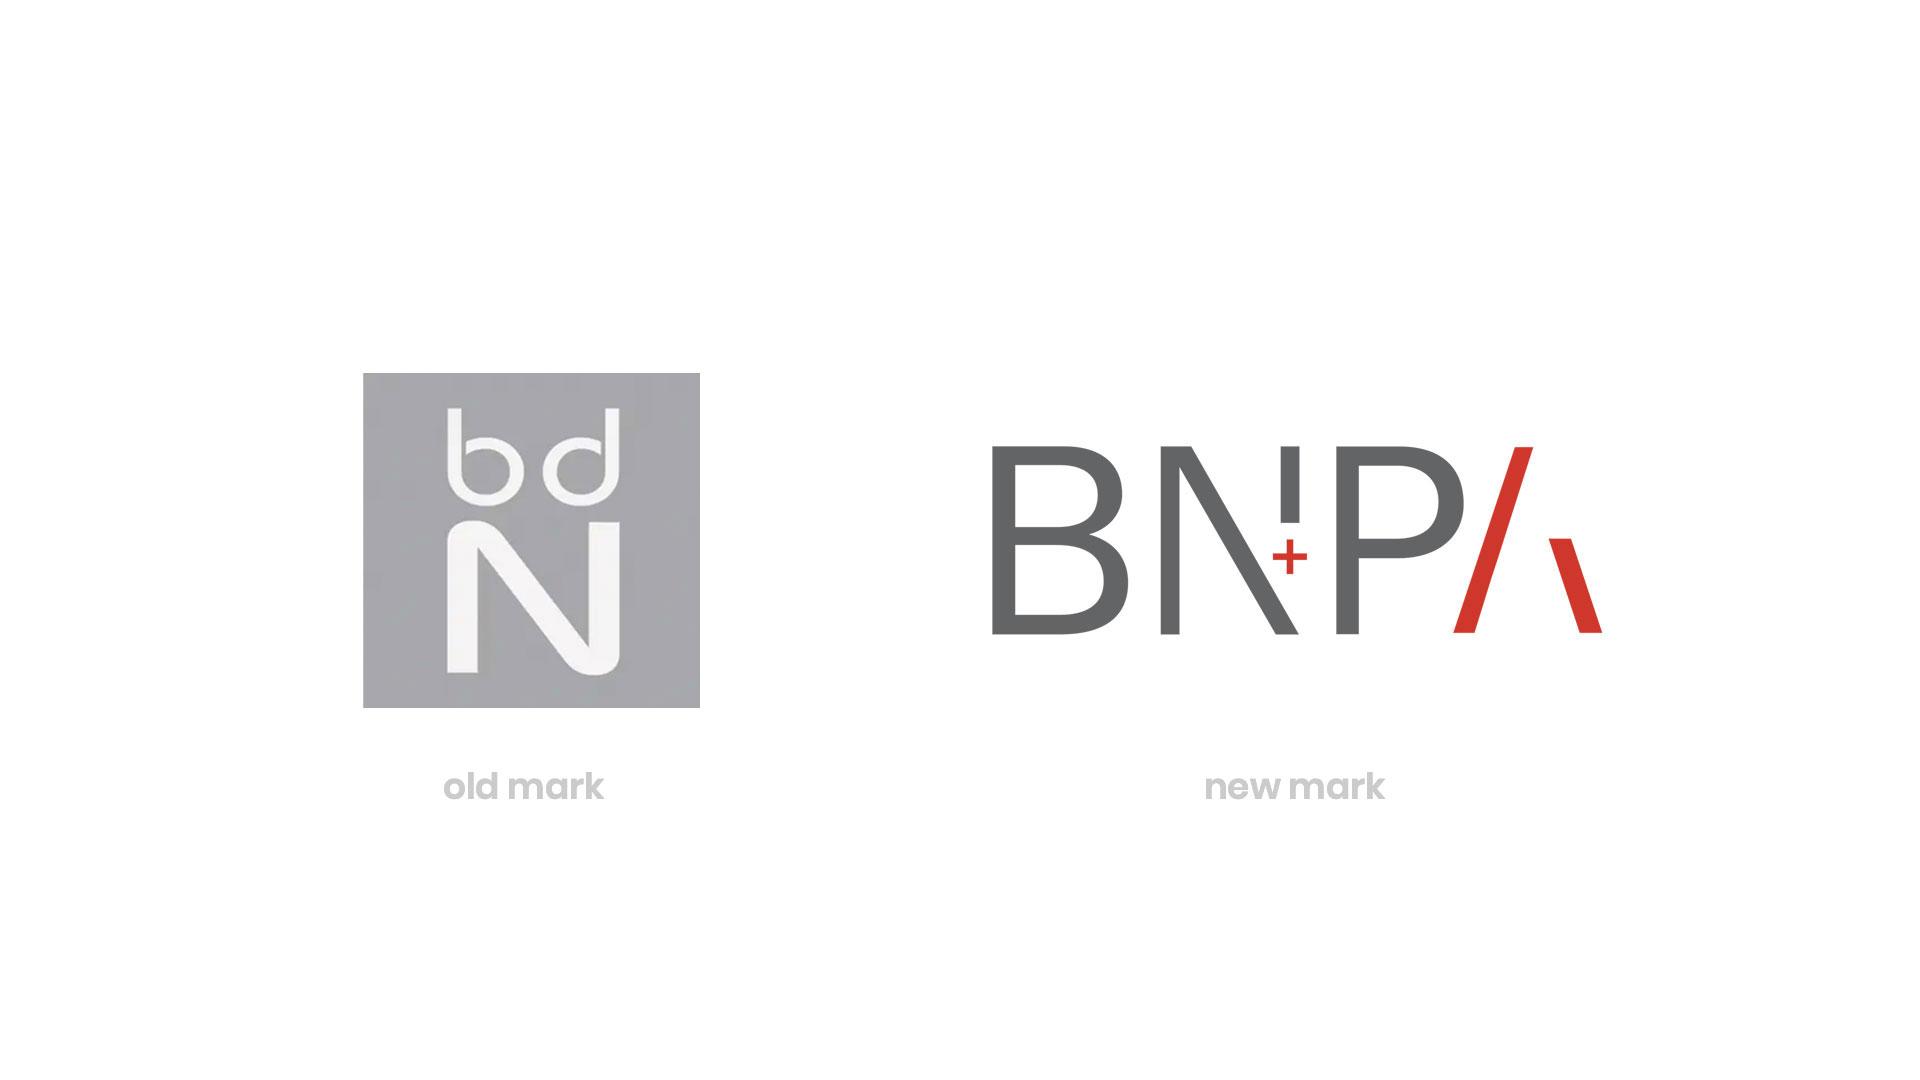 Bruce Nagel + Associates New Brand Identity